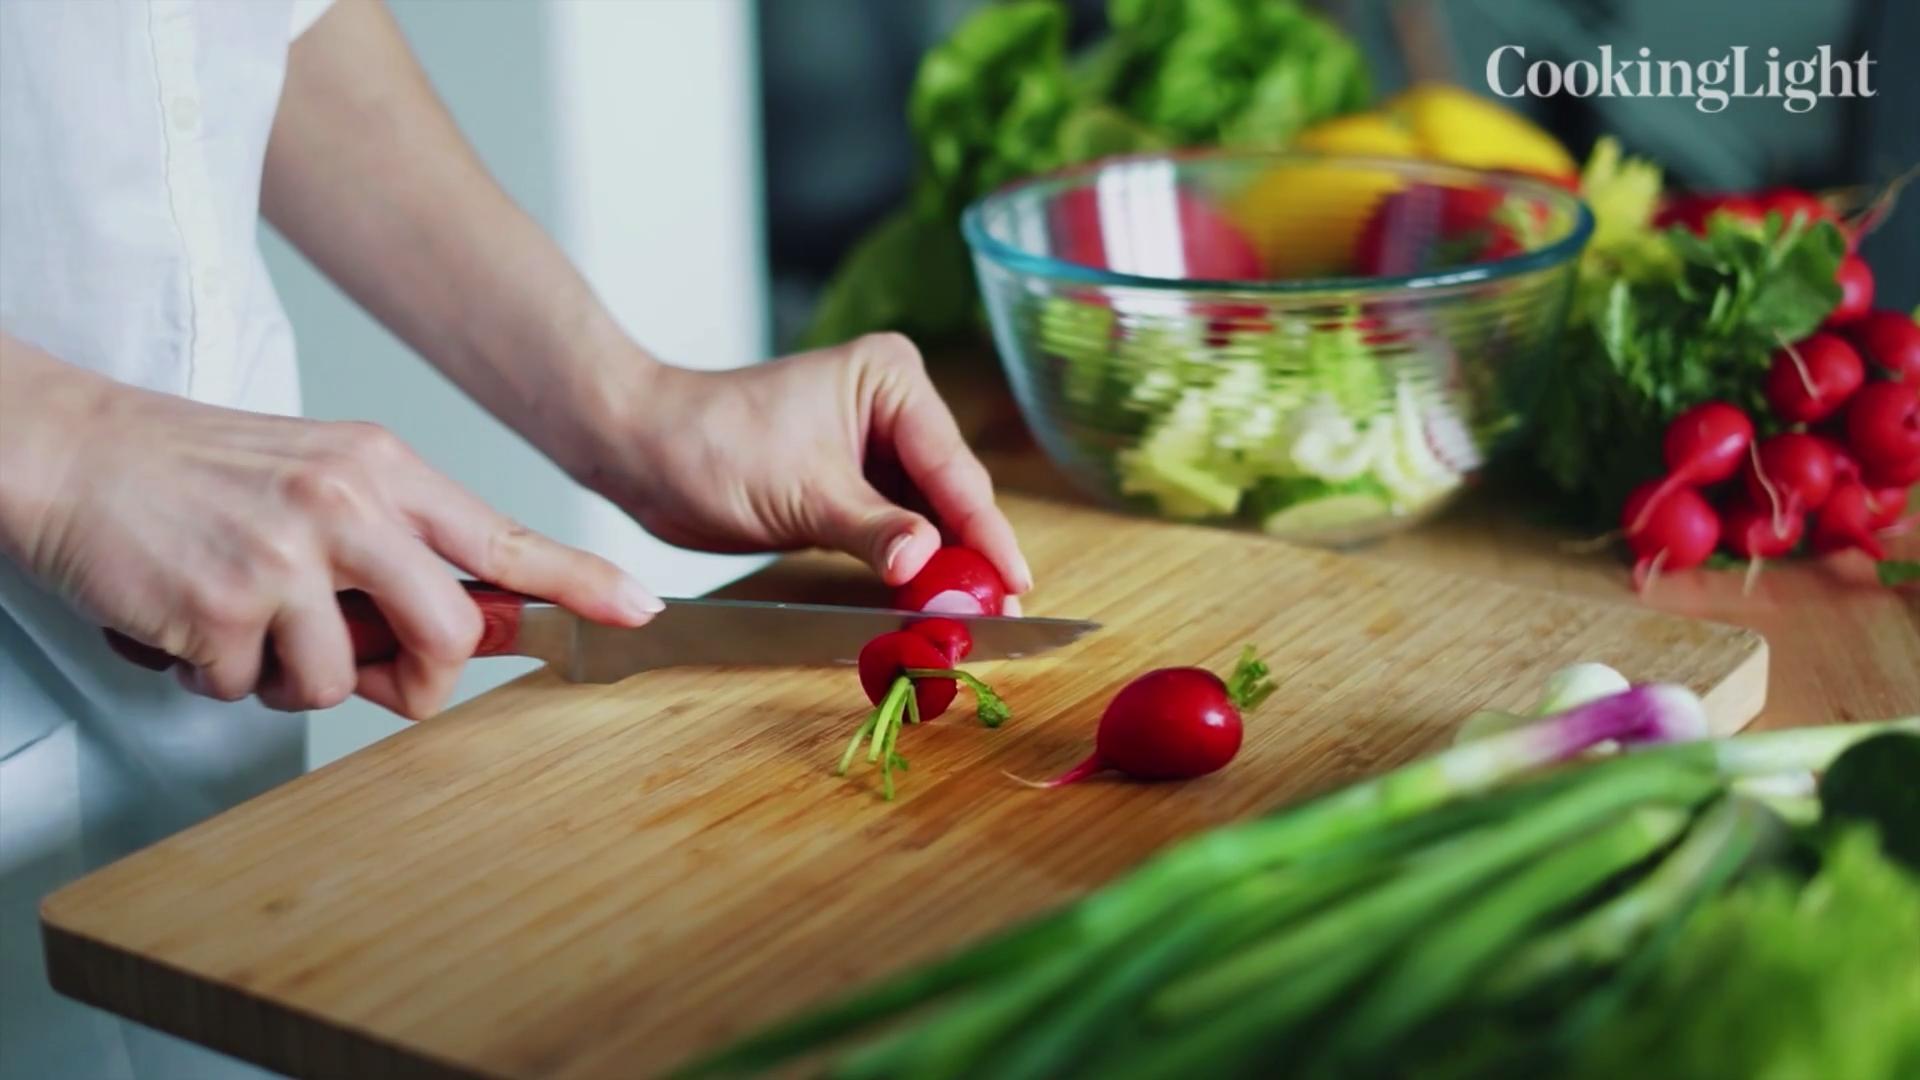 Simple 100-Calorie Food Swaps